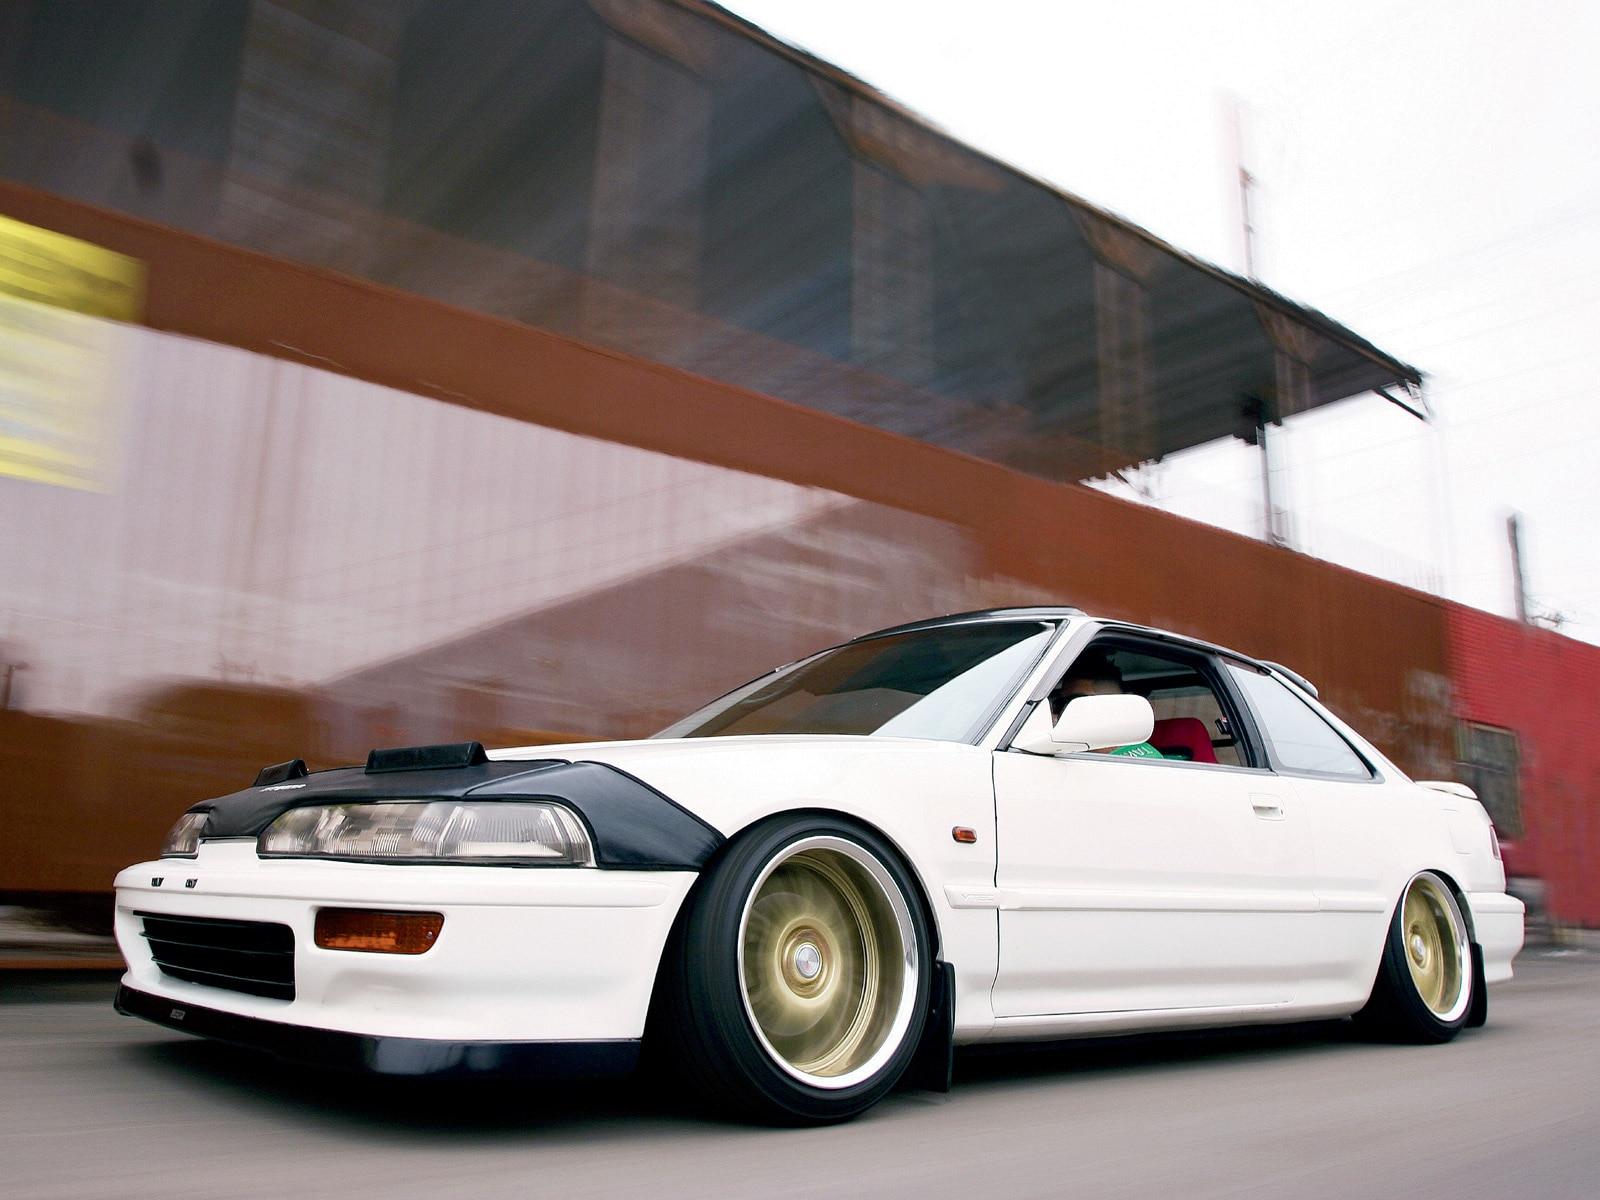 1992 Acura Integra Gs R Skunk2 Intake Honda Tuning Magazine